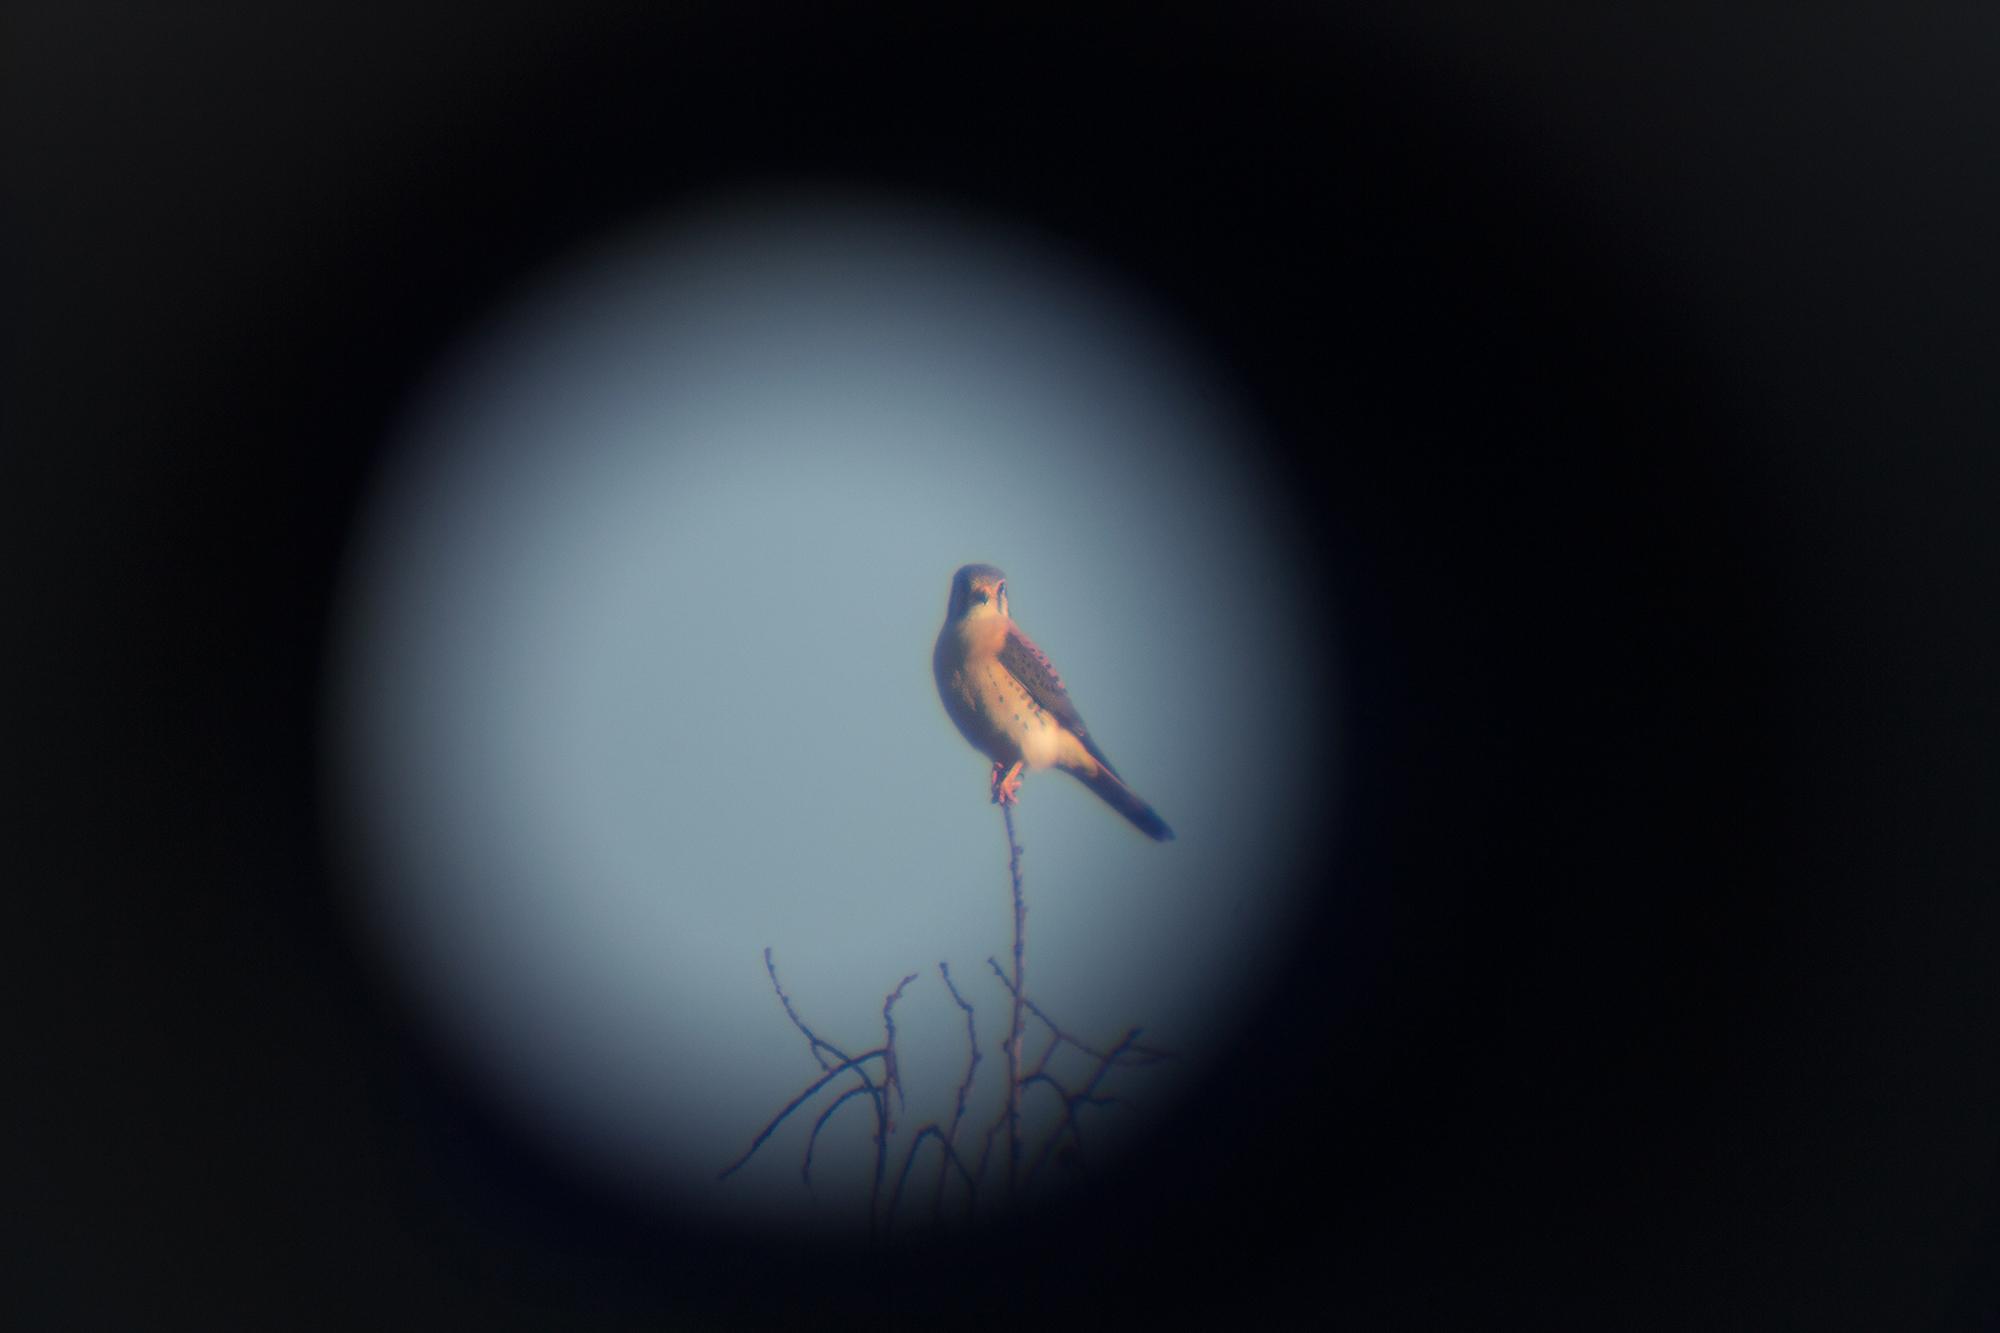 telescopebird